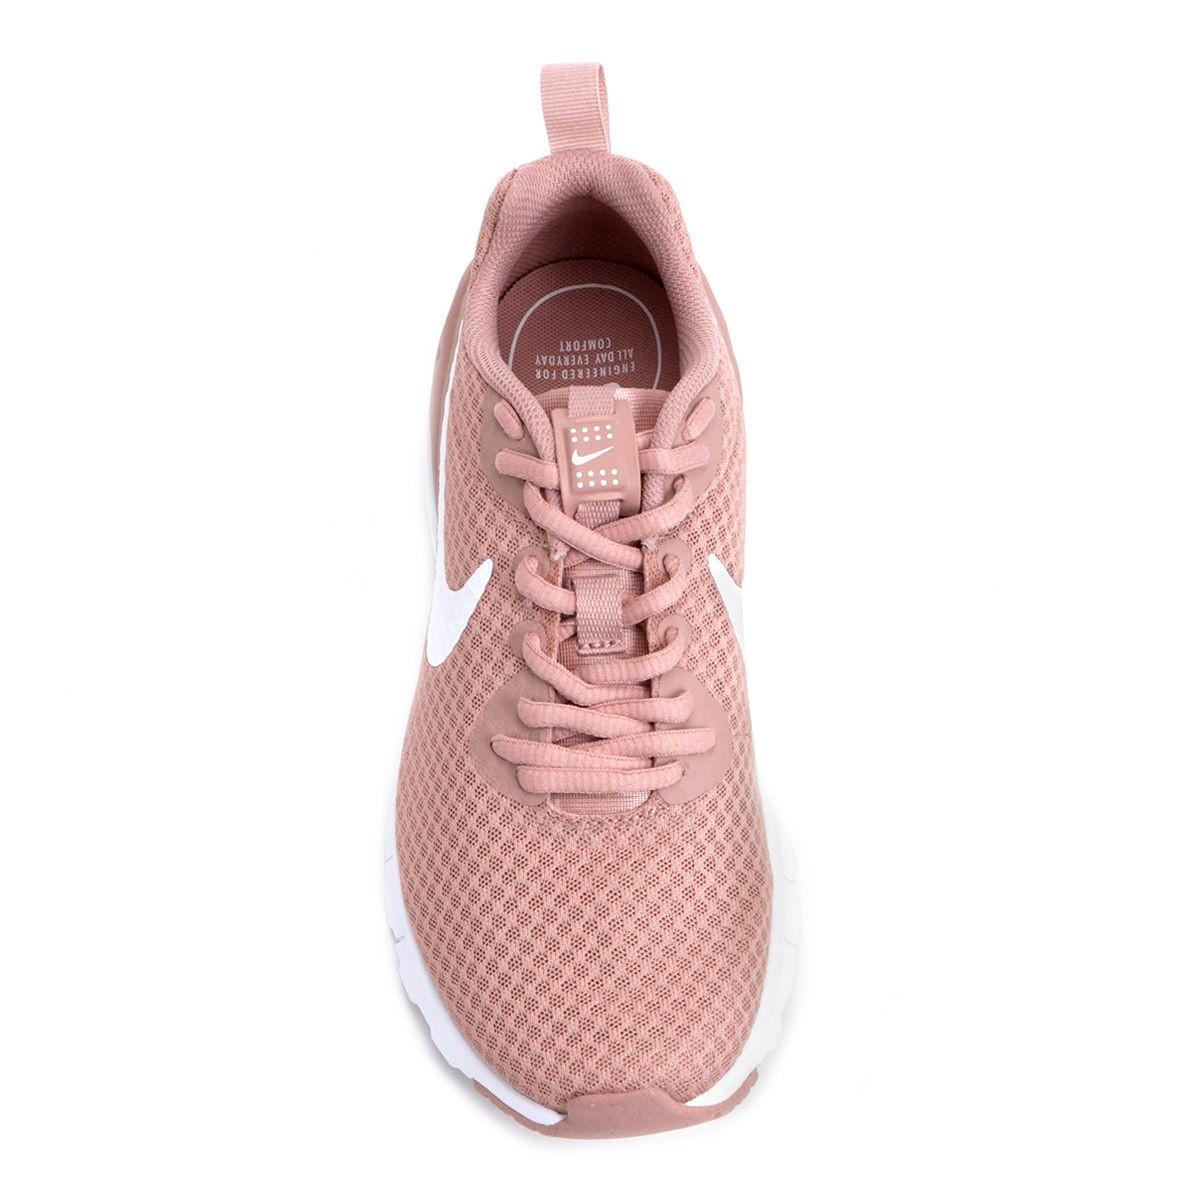 557b1abdcd Tênis Nike Nike Tênis Air Max Motion LW Feminino Rosa brancoo Joinville  ccb22a